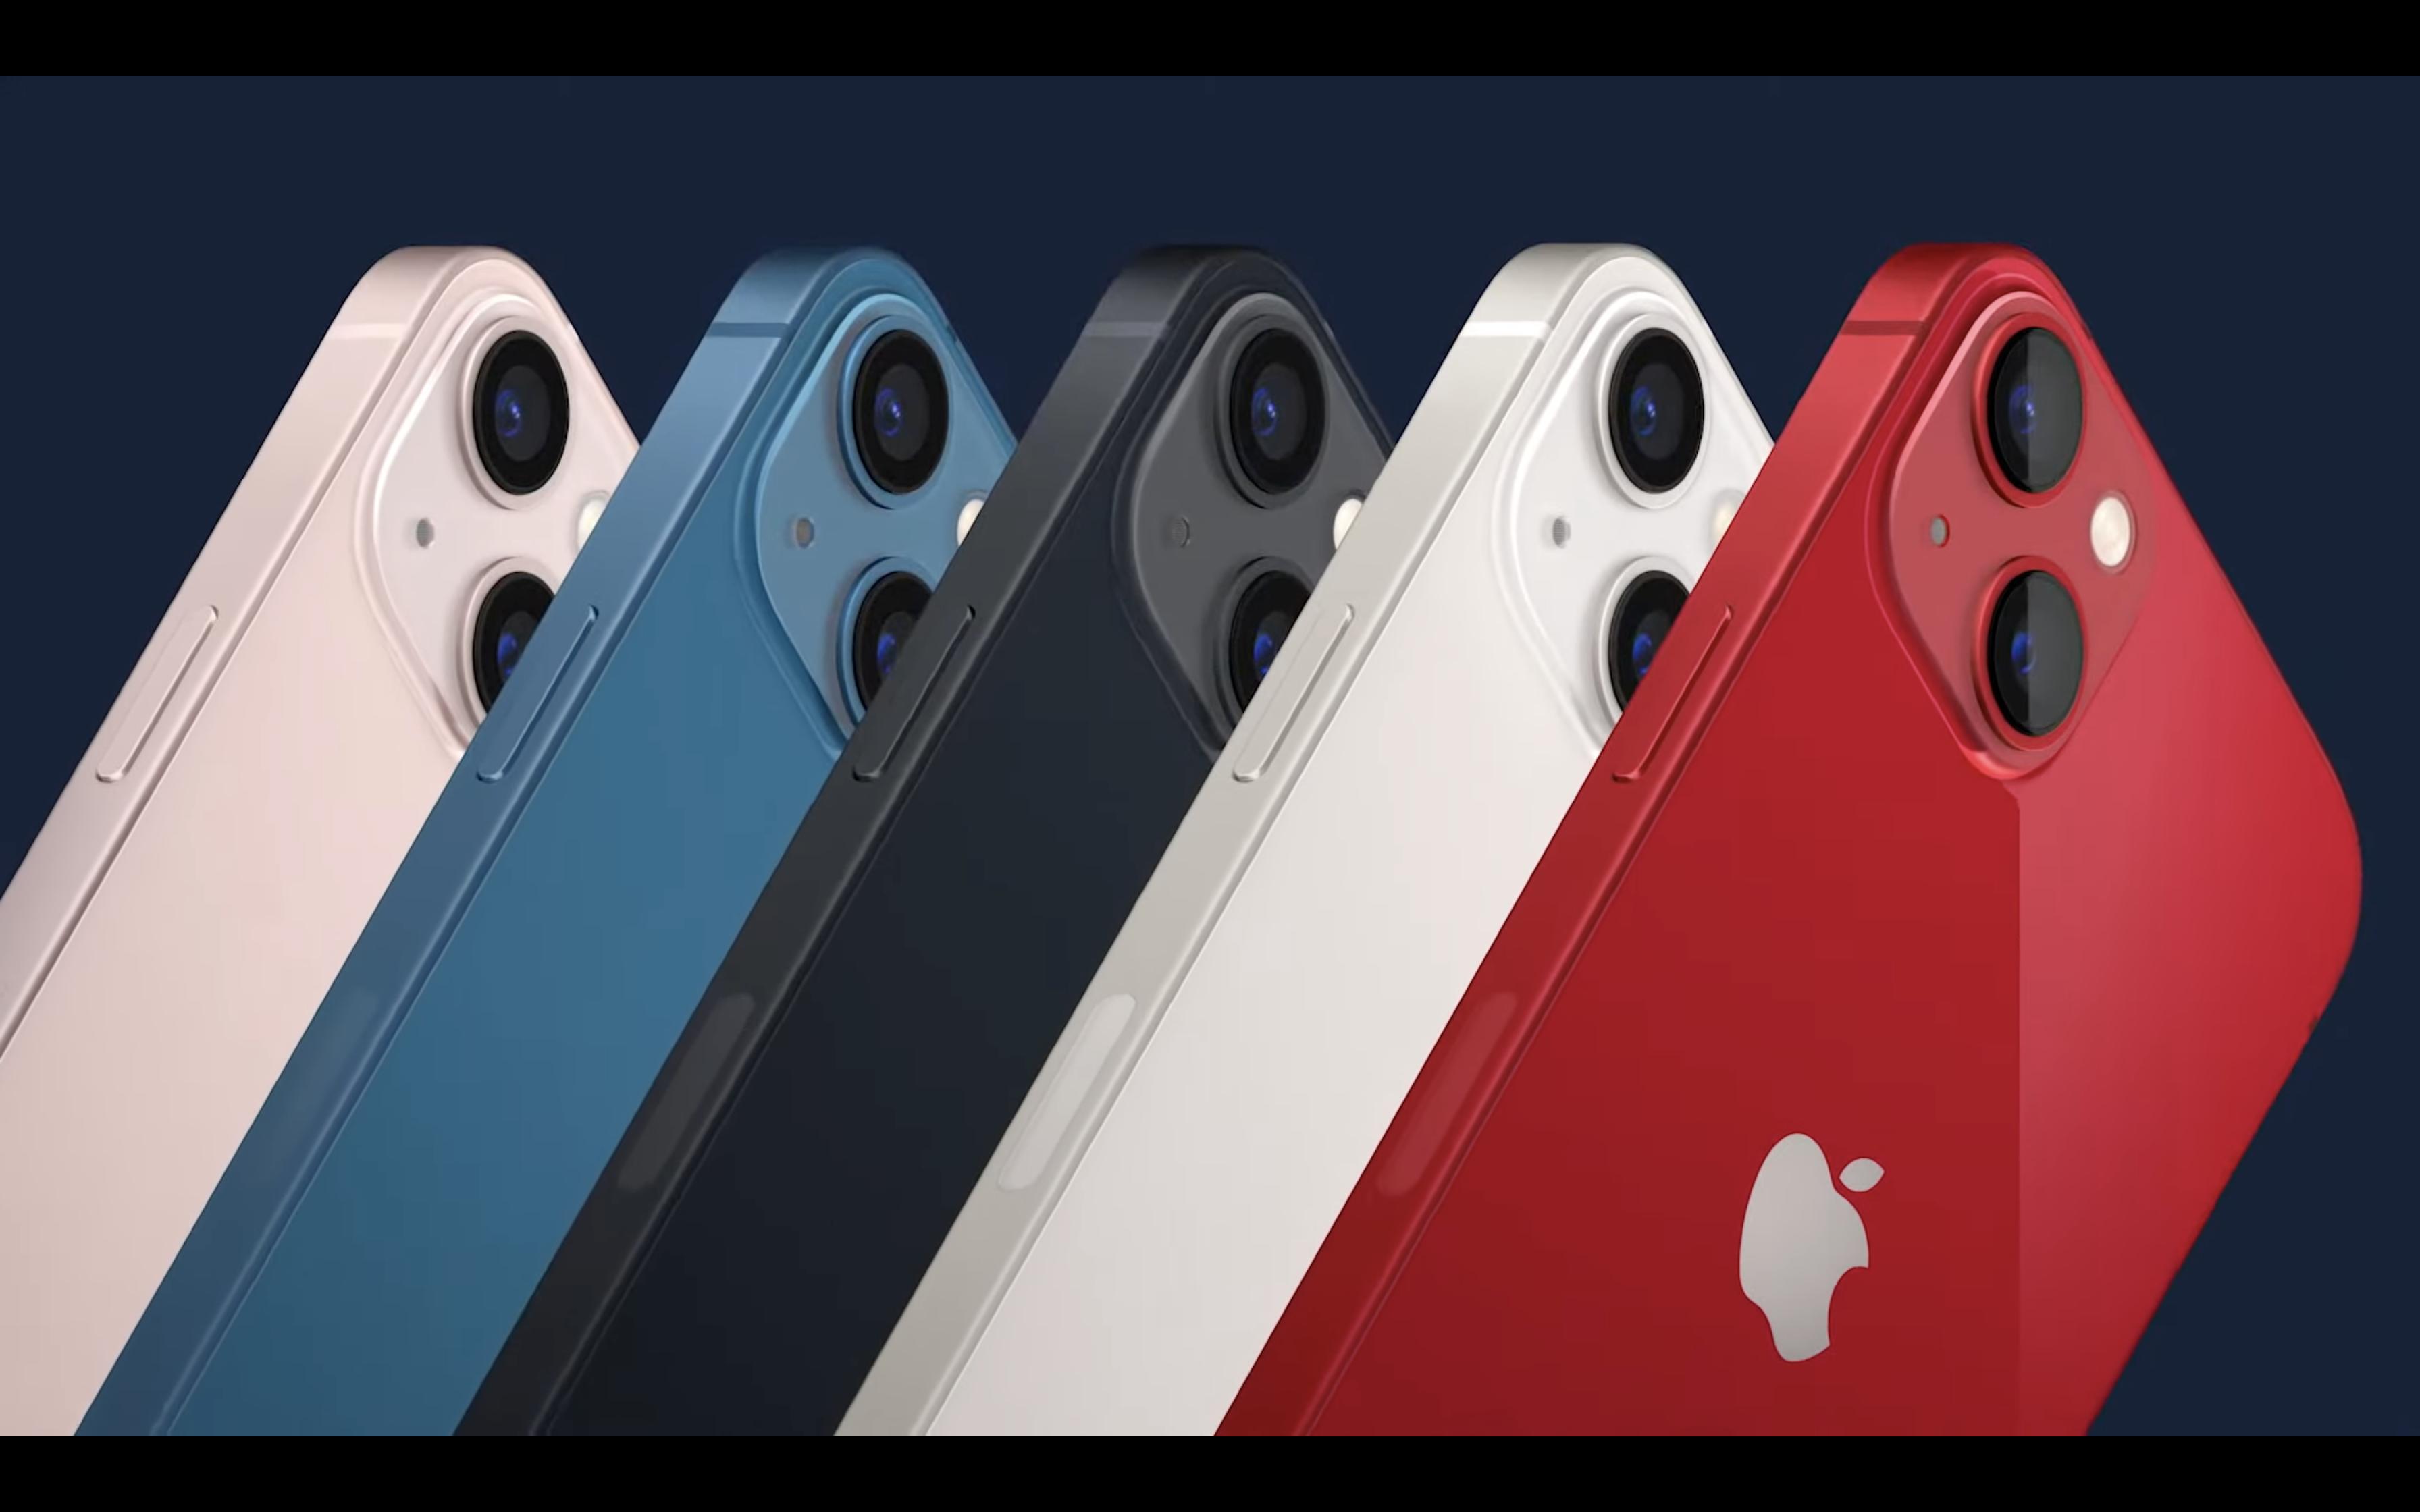 Apple iPhone 13 mini (512GB)規格、價錢與介紹 - ePrice.HK 流動版-0